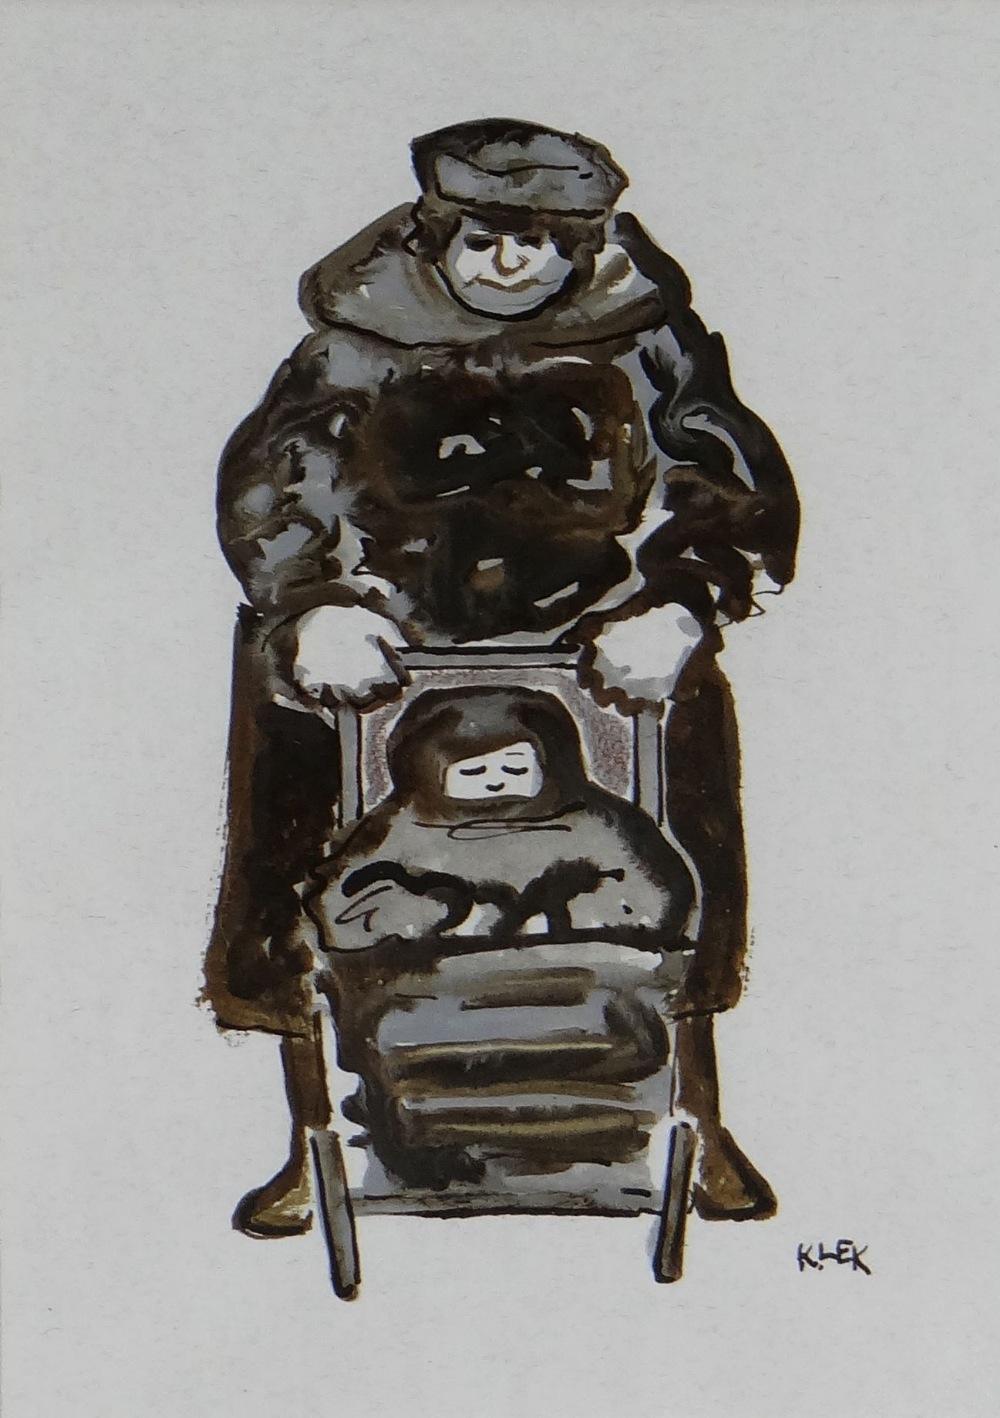 KAREL LEK mixed media - lady pushing child in a pram, entitled verso 'Buggy', signed, 24 x 17cms